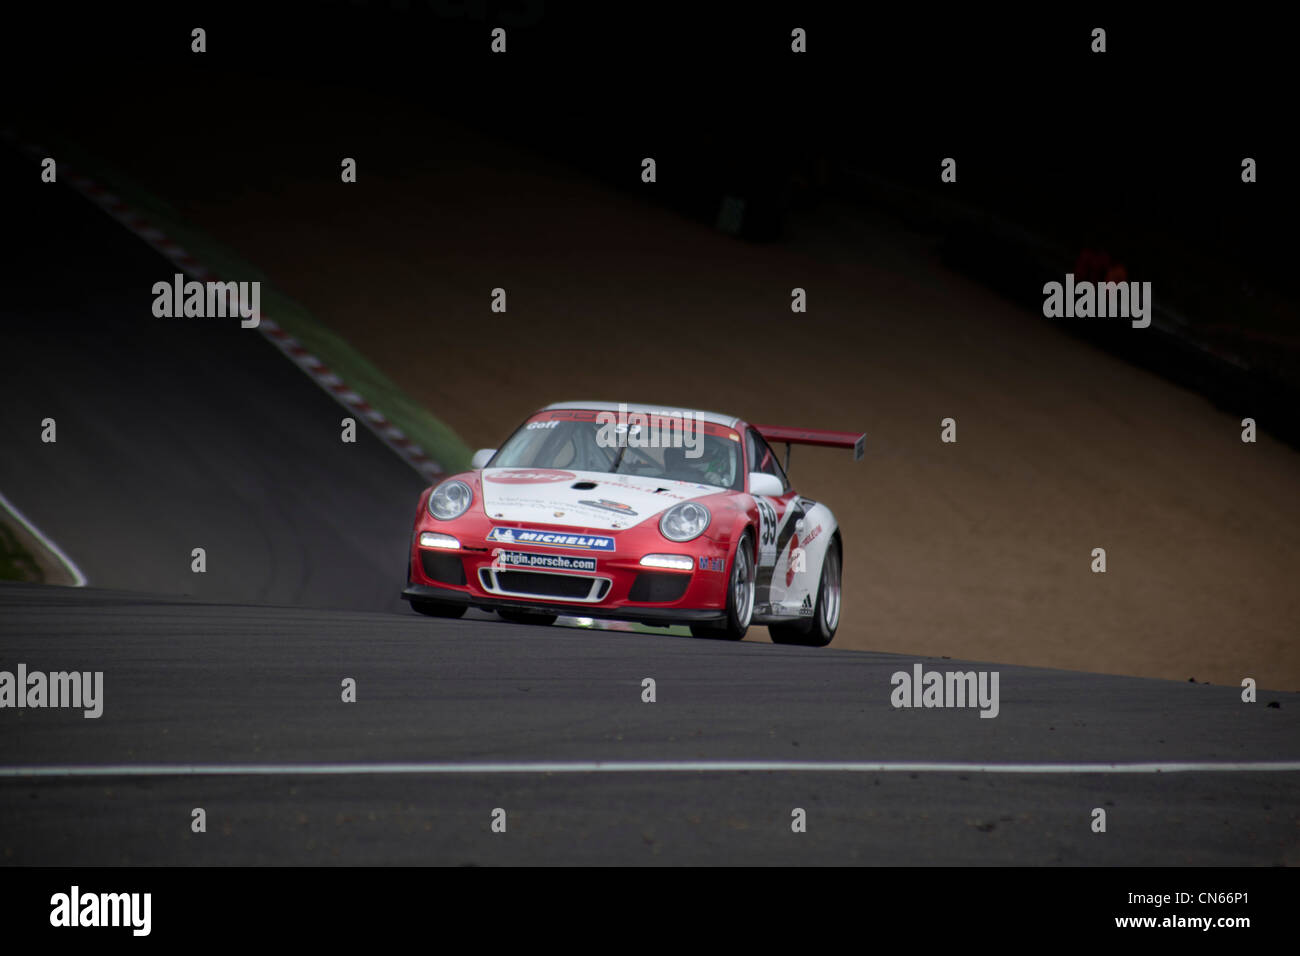 Porsche Carrera Cup, Brands Hatch 31 March 2012 - Stock Image